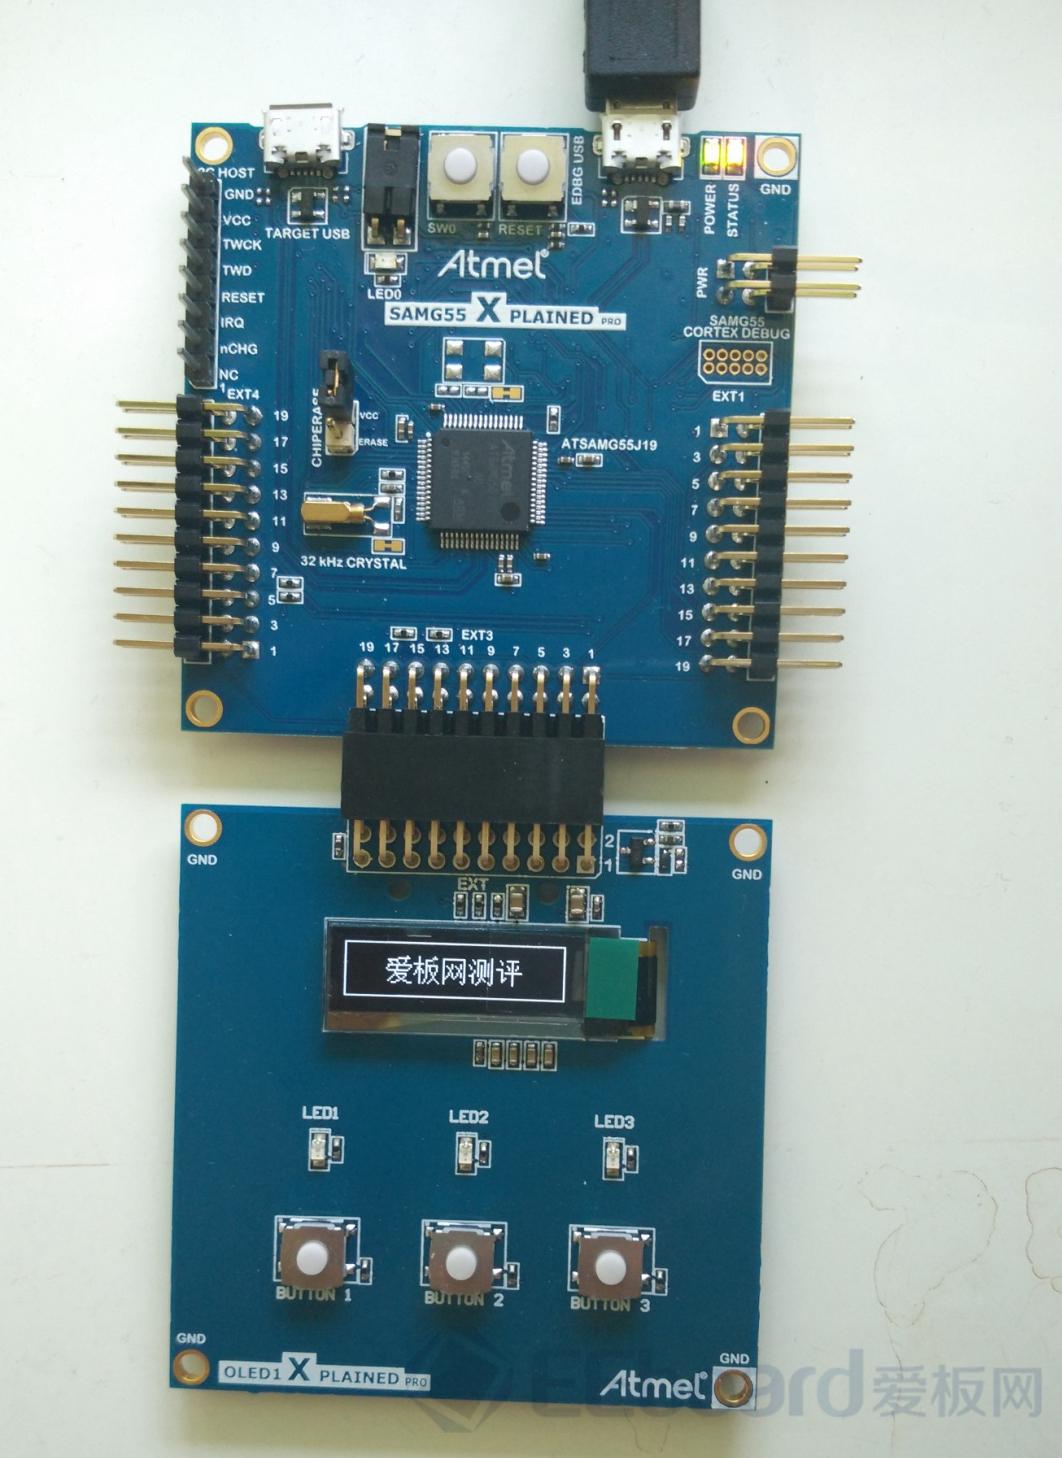 ATMEL新貴——SAM G55簡單試用(原創代碼)